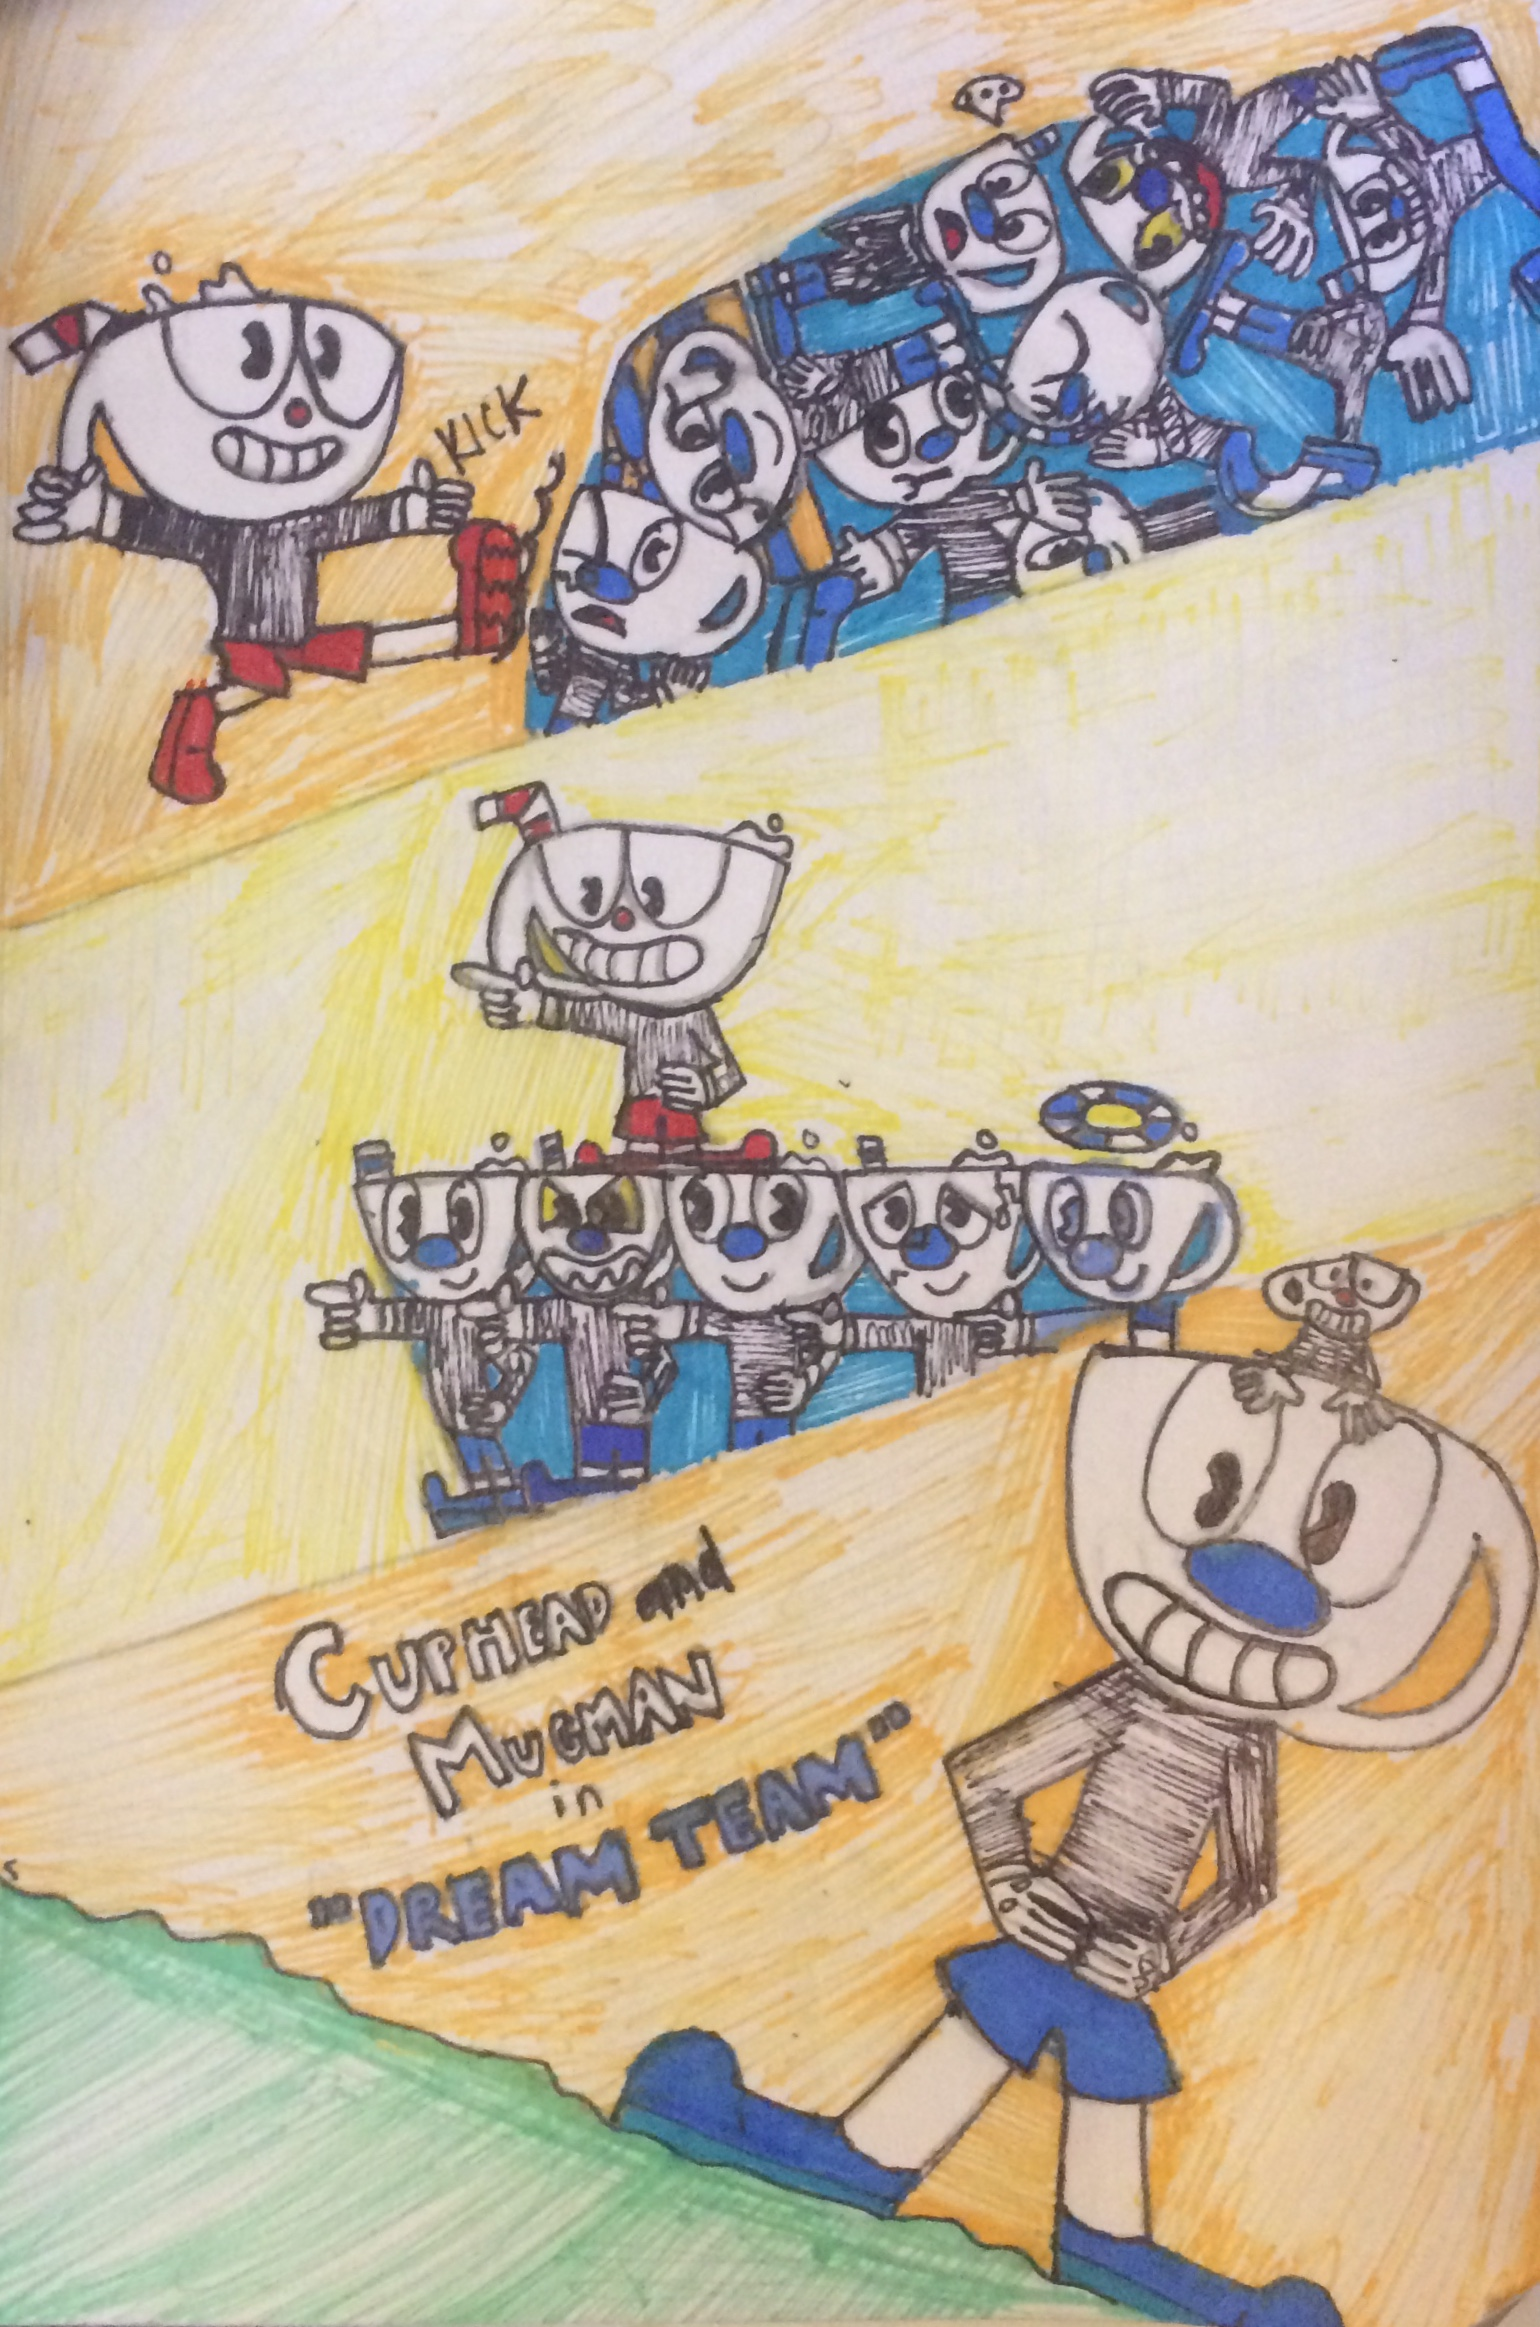 Overwatch Girl Fanart Wallpaper Cuphead Amp Mugman Dream Team Cuphead Know Your Meme